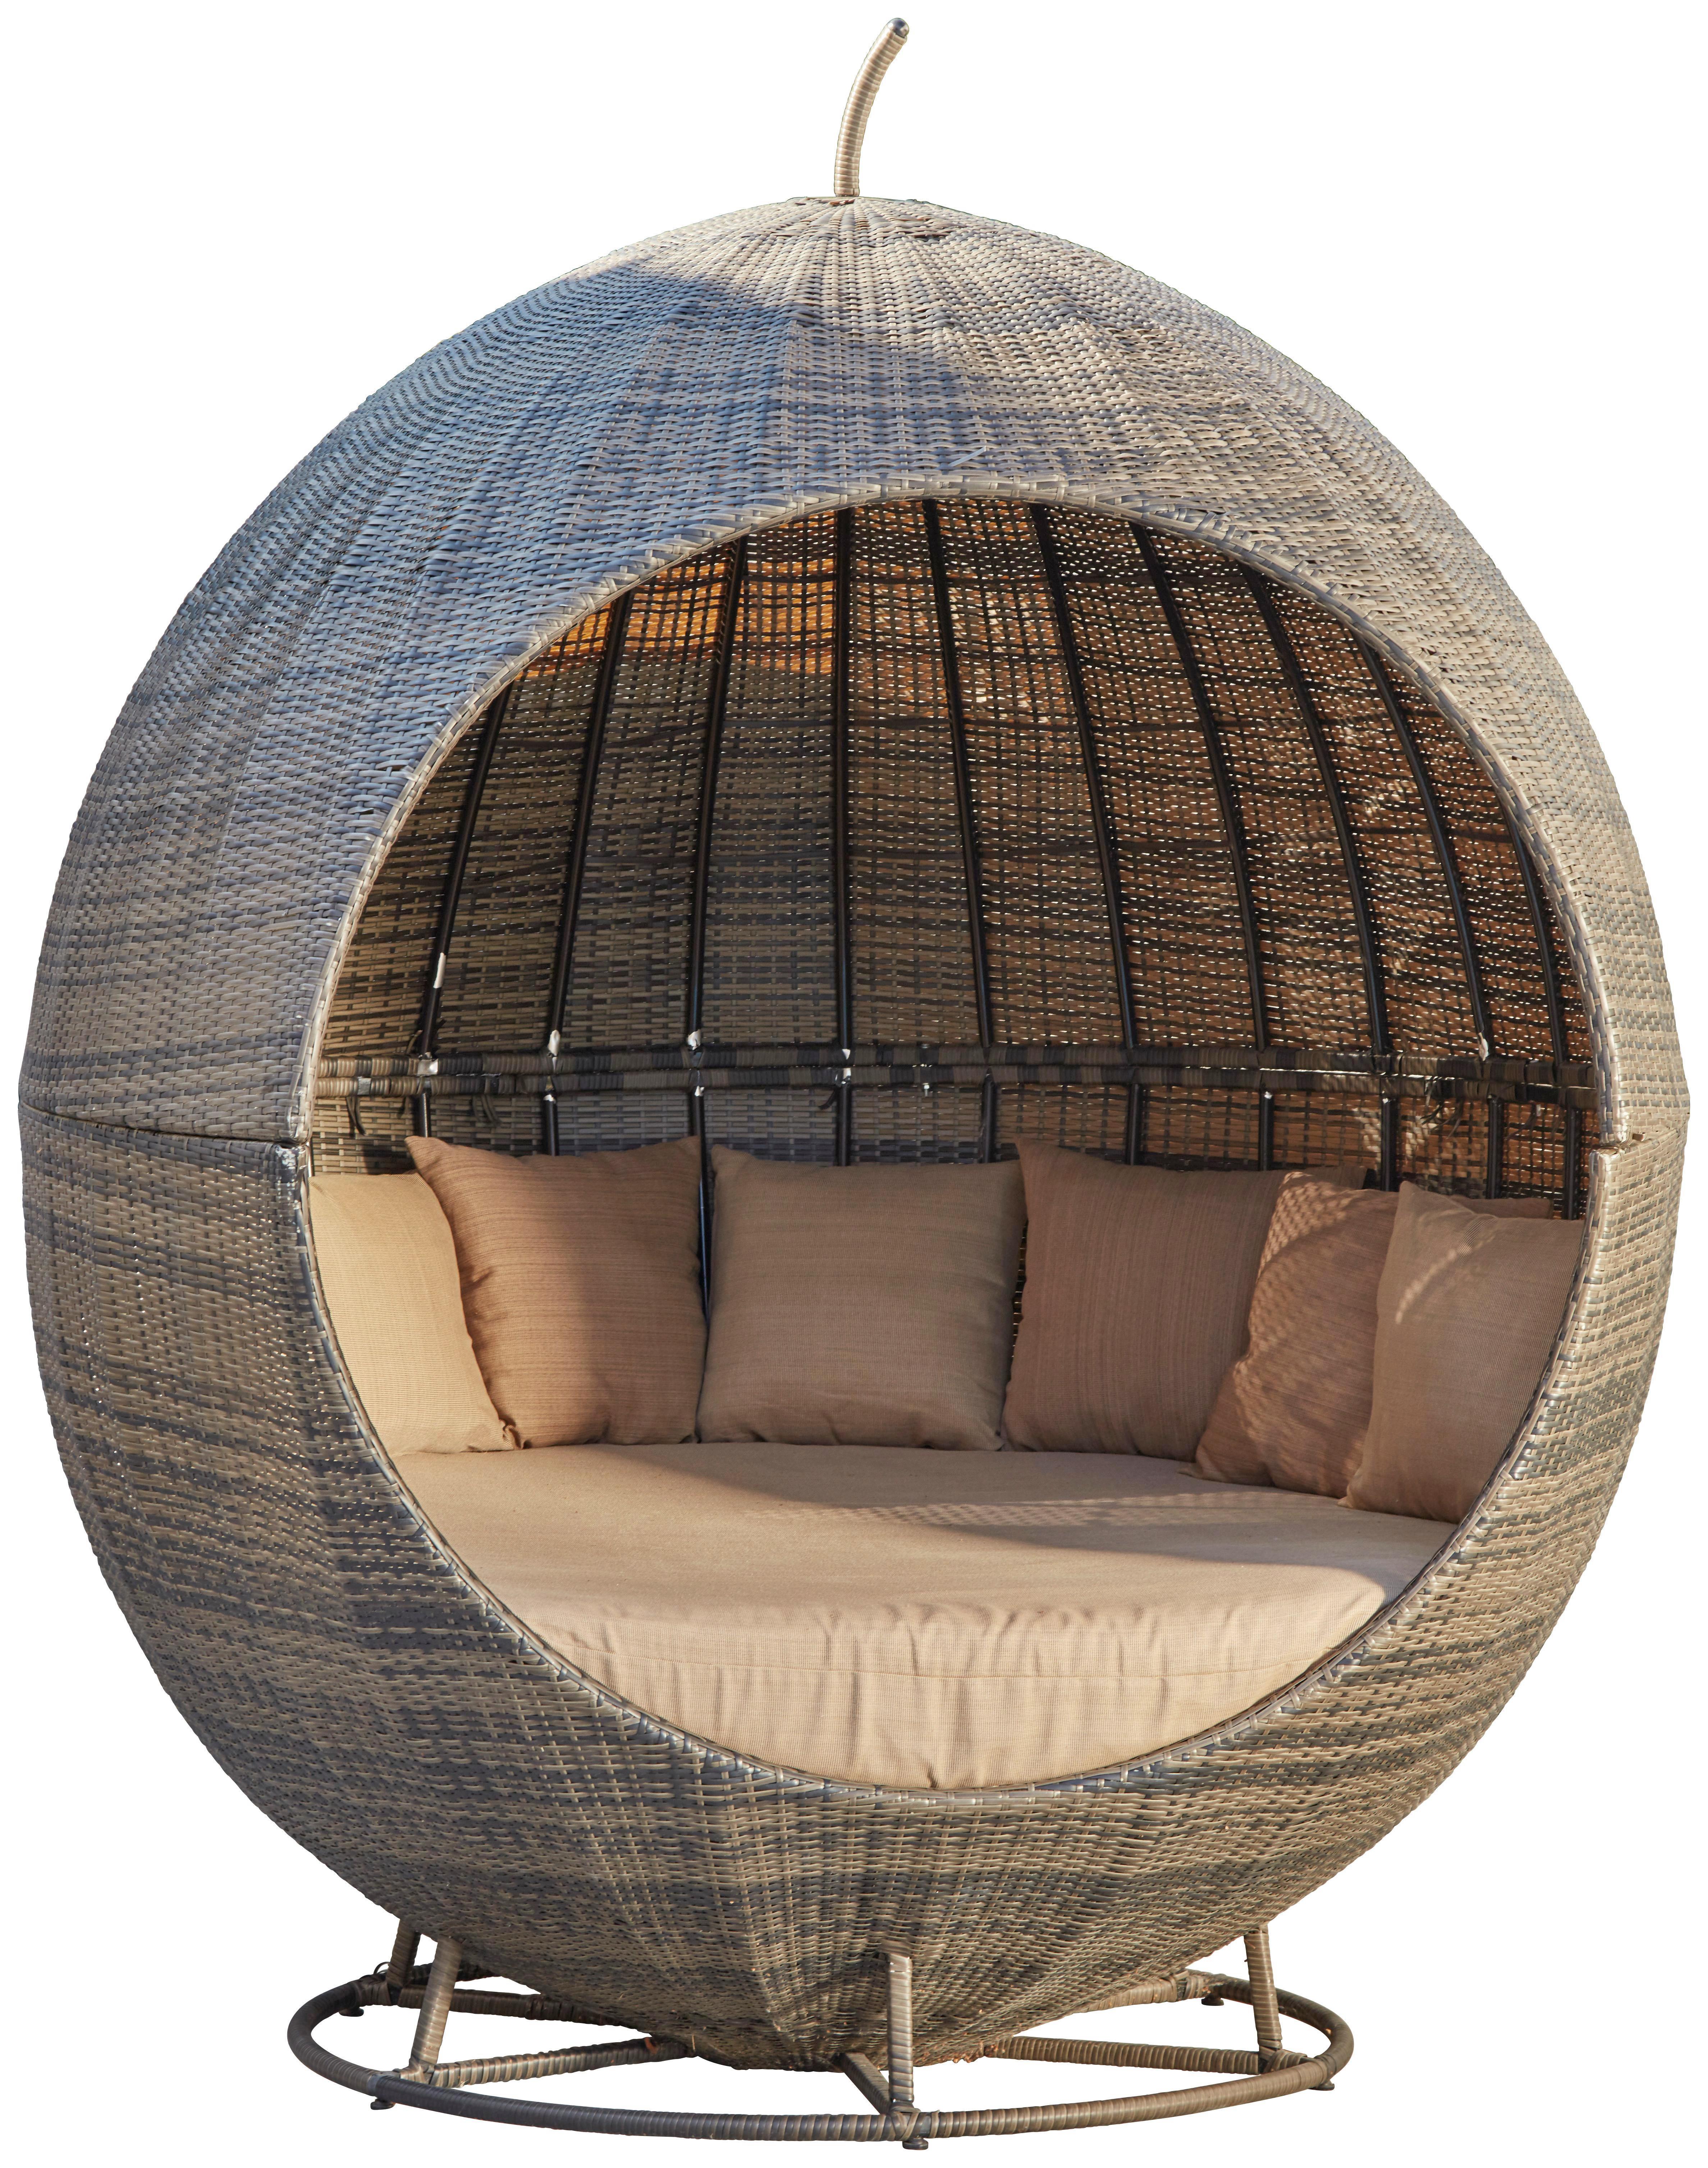 sonneninsel kaufen stunning landmann belardo rattan teilige sonneninsel minois inkl polster und. Black Bedroom Furniture Sets. Home Design Ideas